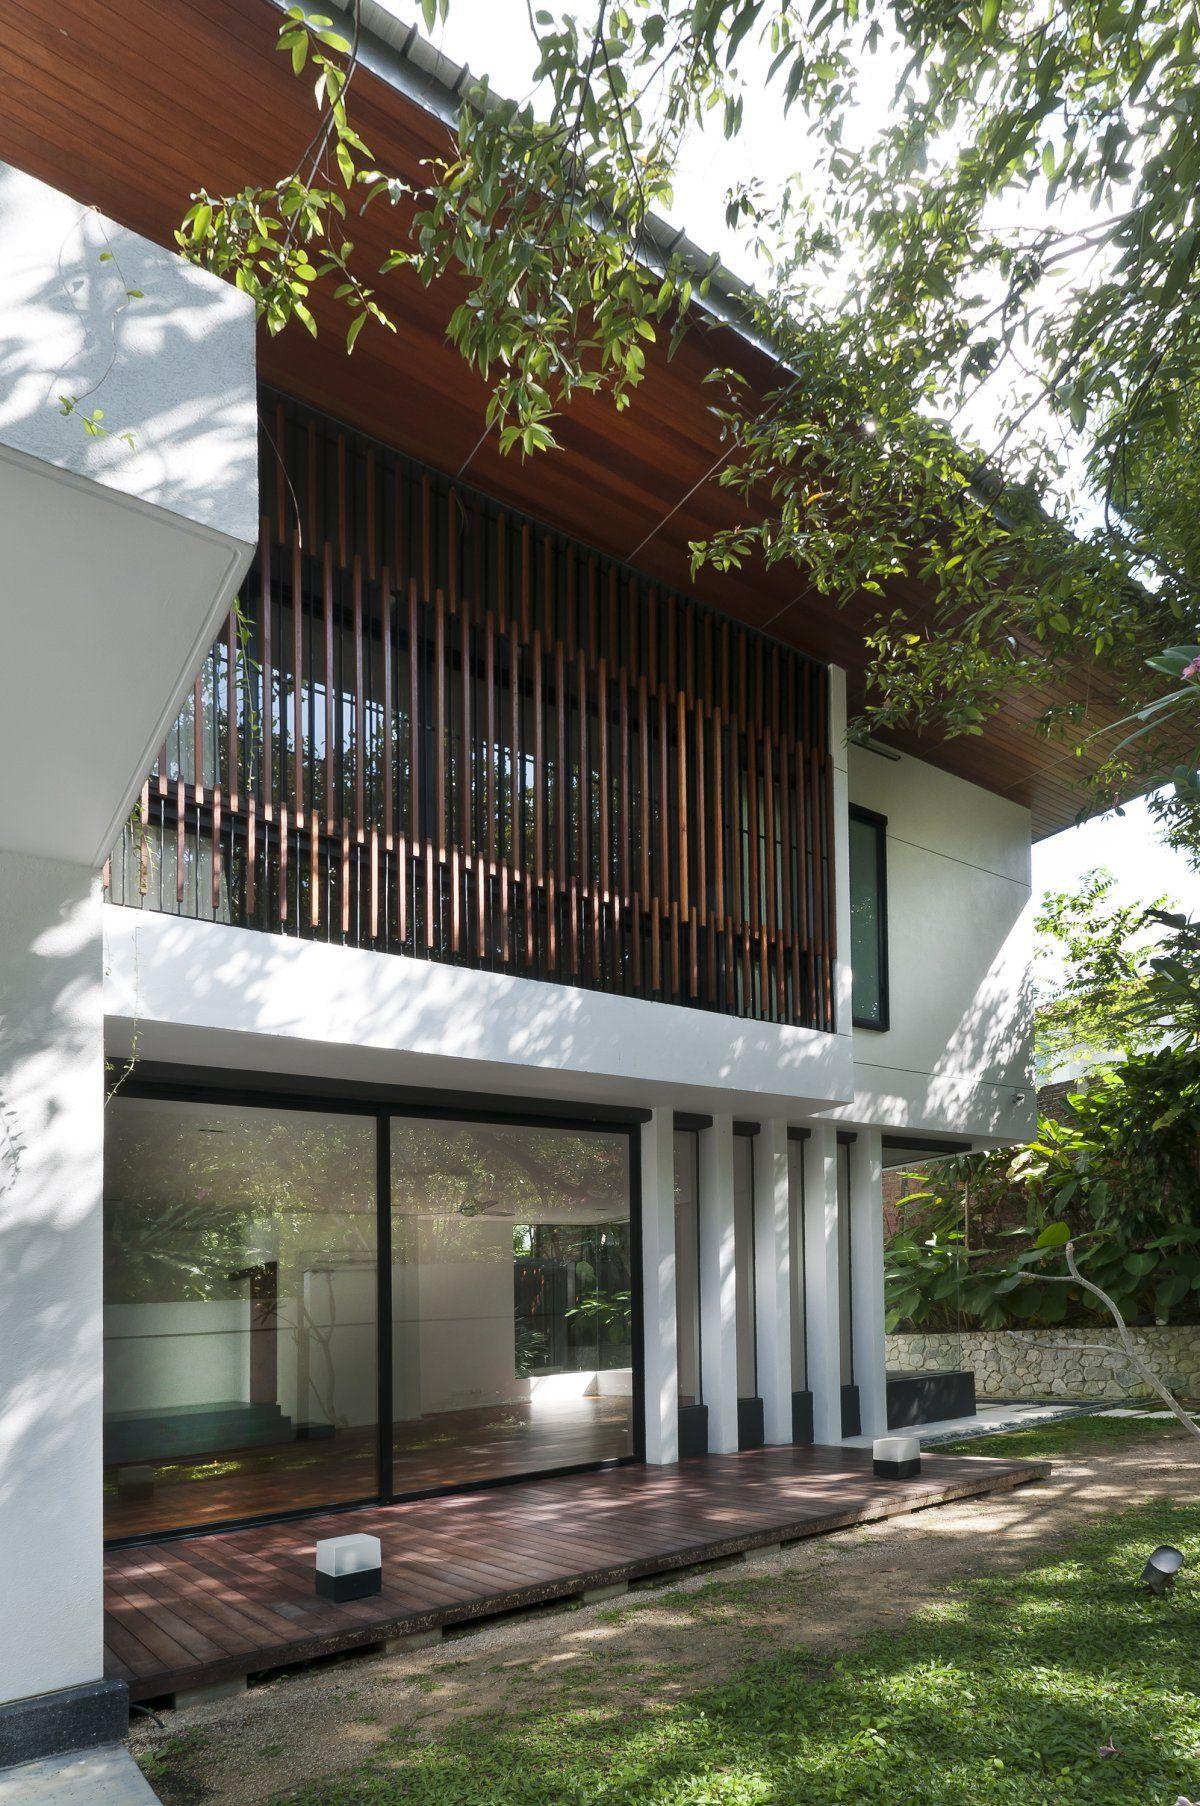 Interesting House Exterior Design In Kulai Malaysia: Hijauan House - Interesting Kuala Lumpur Bungalow Design